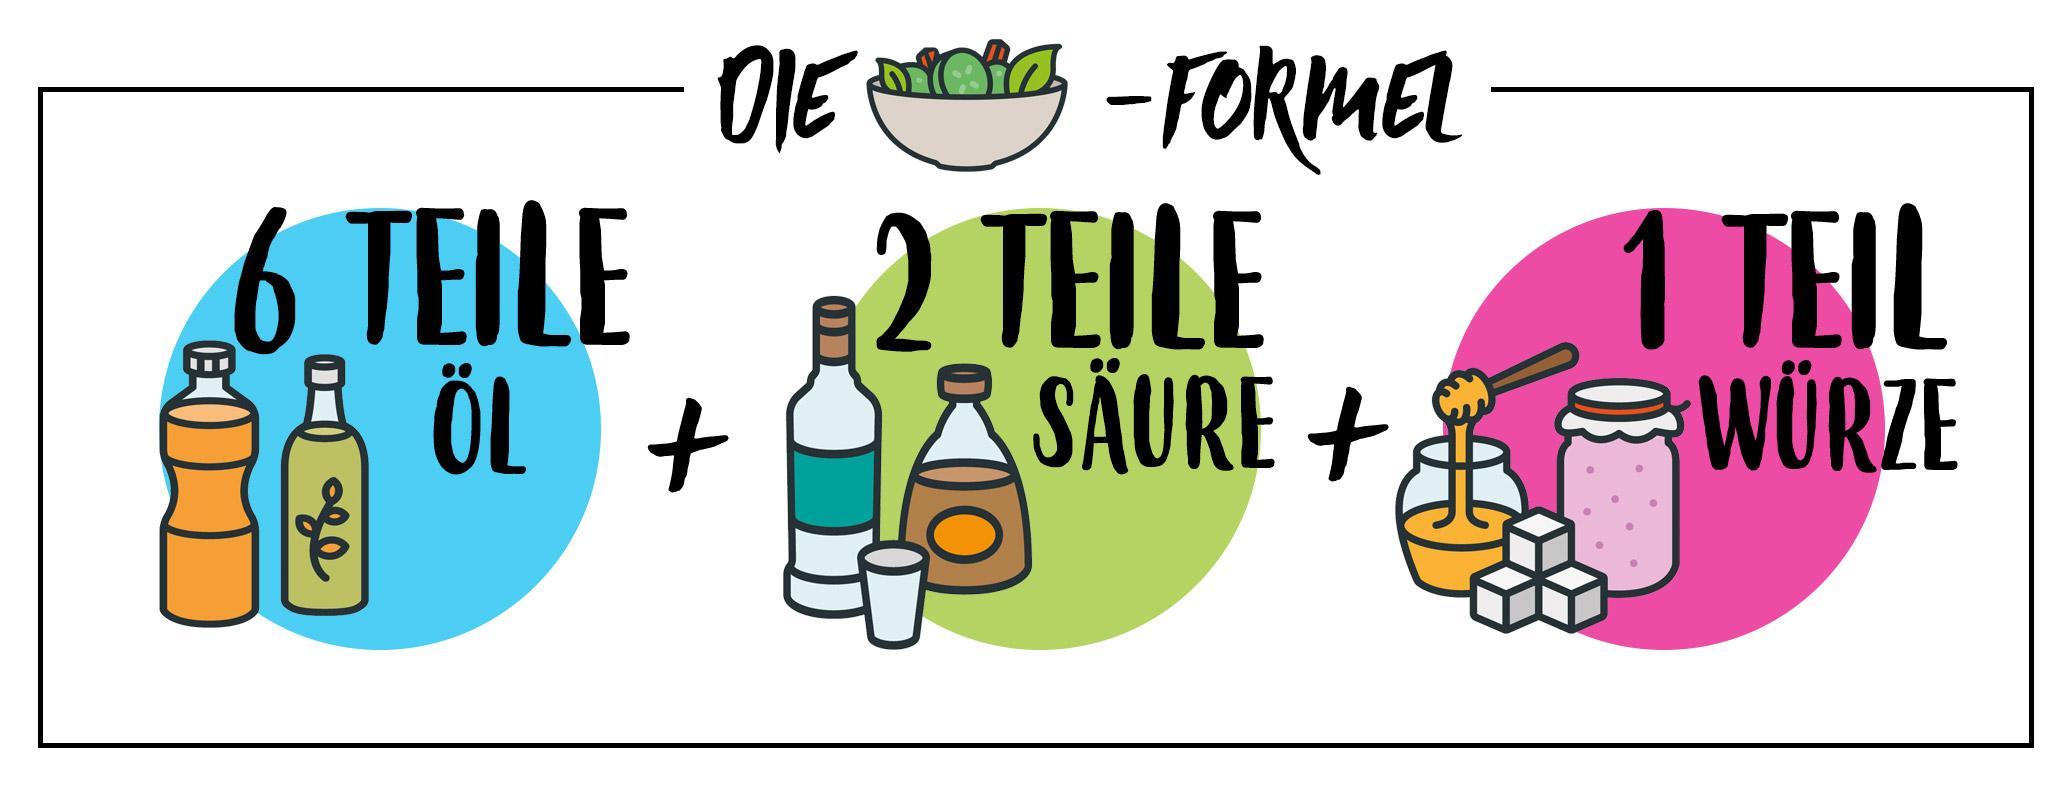 Salatformel_2